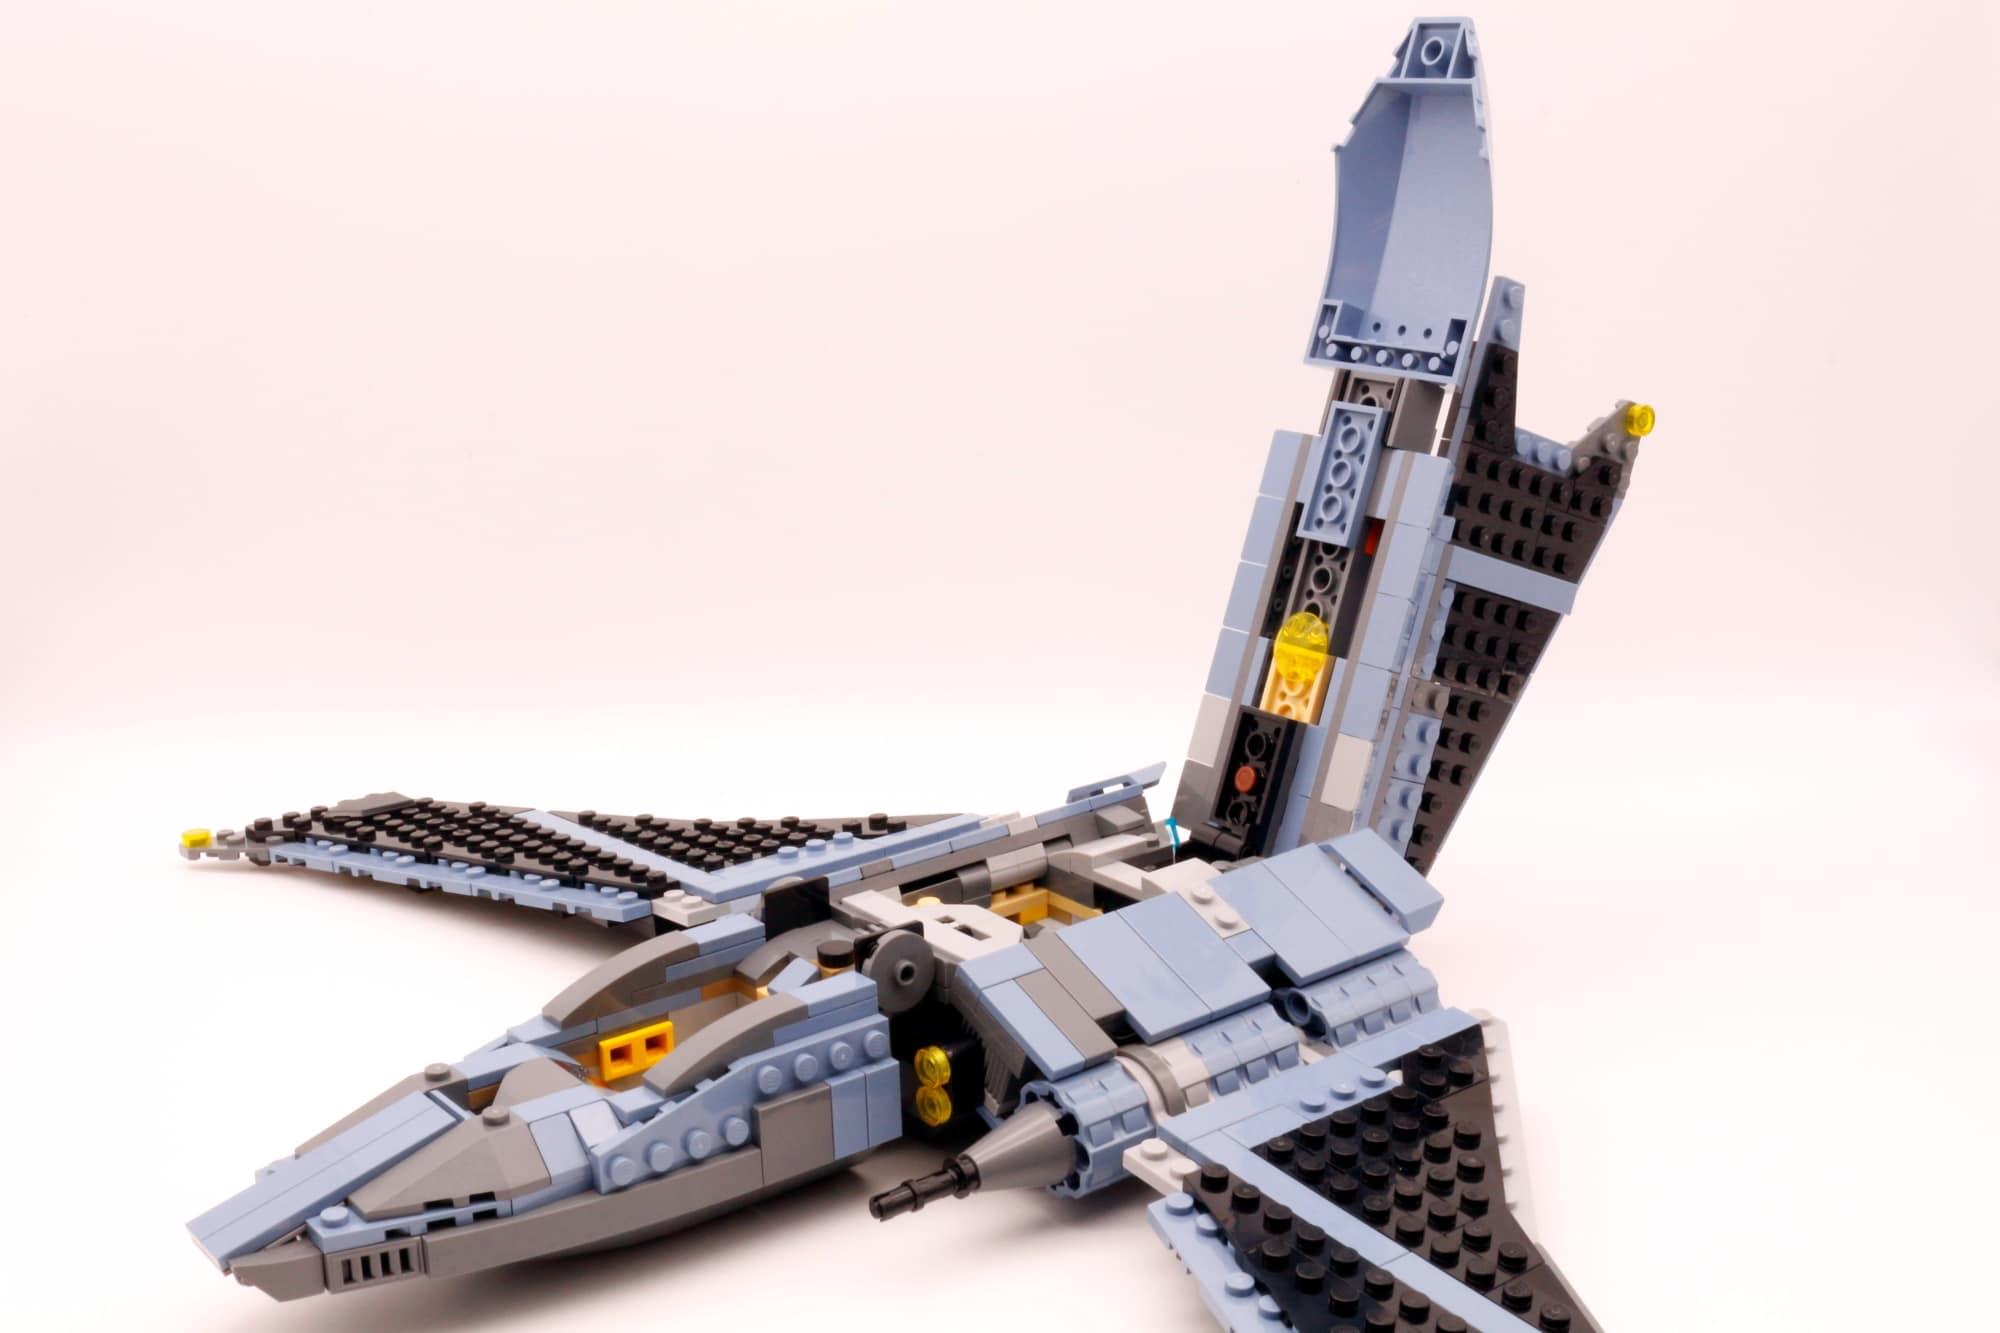 LEGO Star Wars 75314 The Bad Batch Attack Shuttle 9